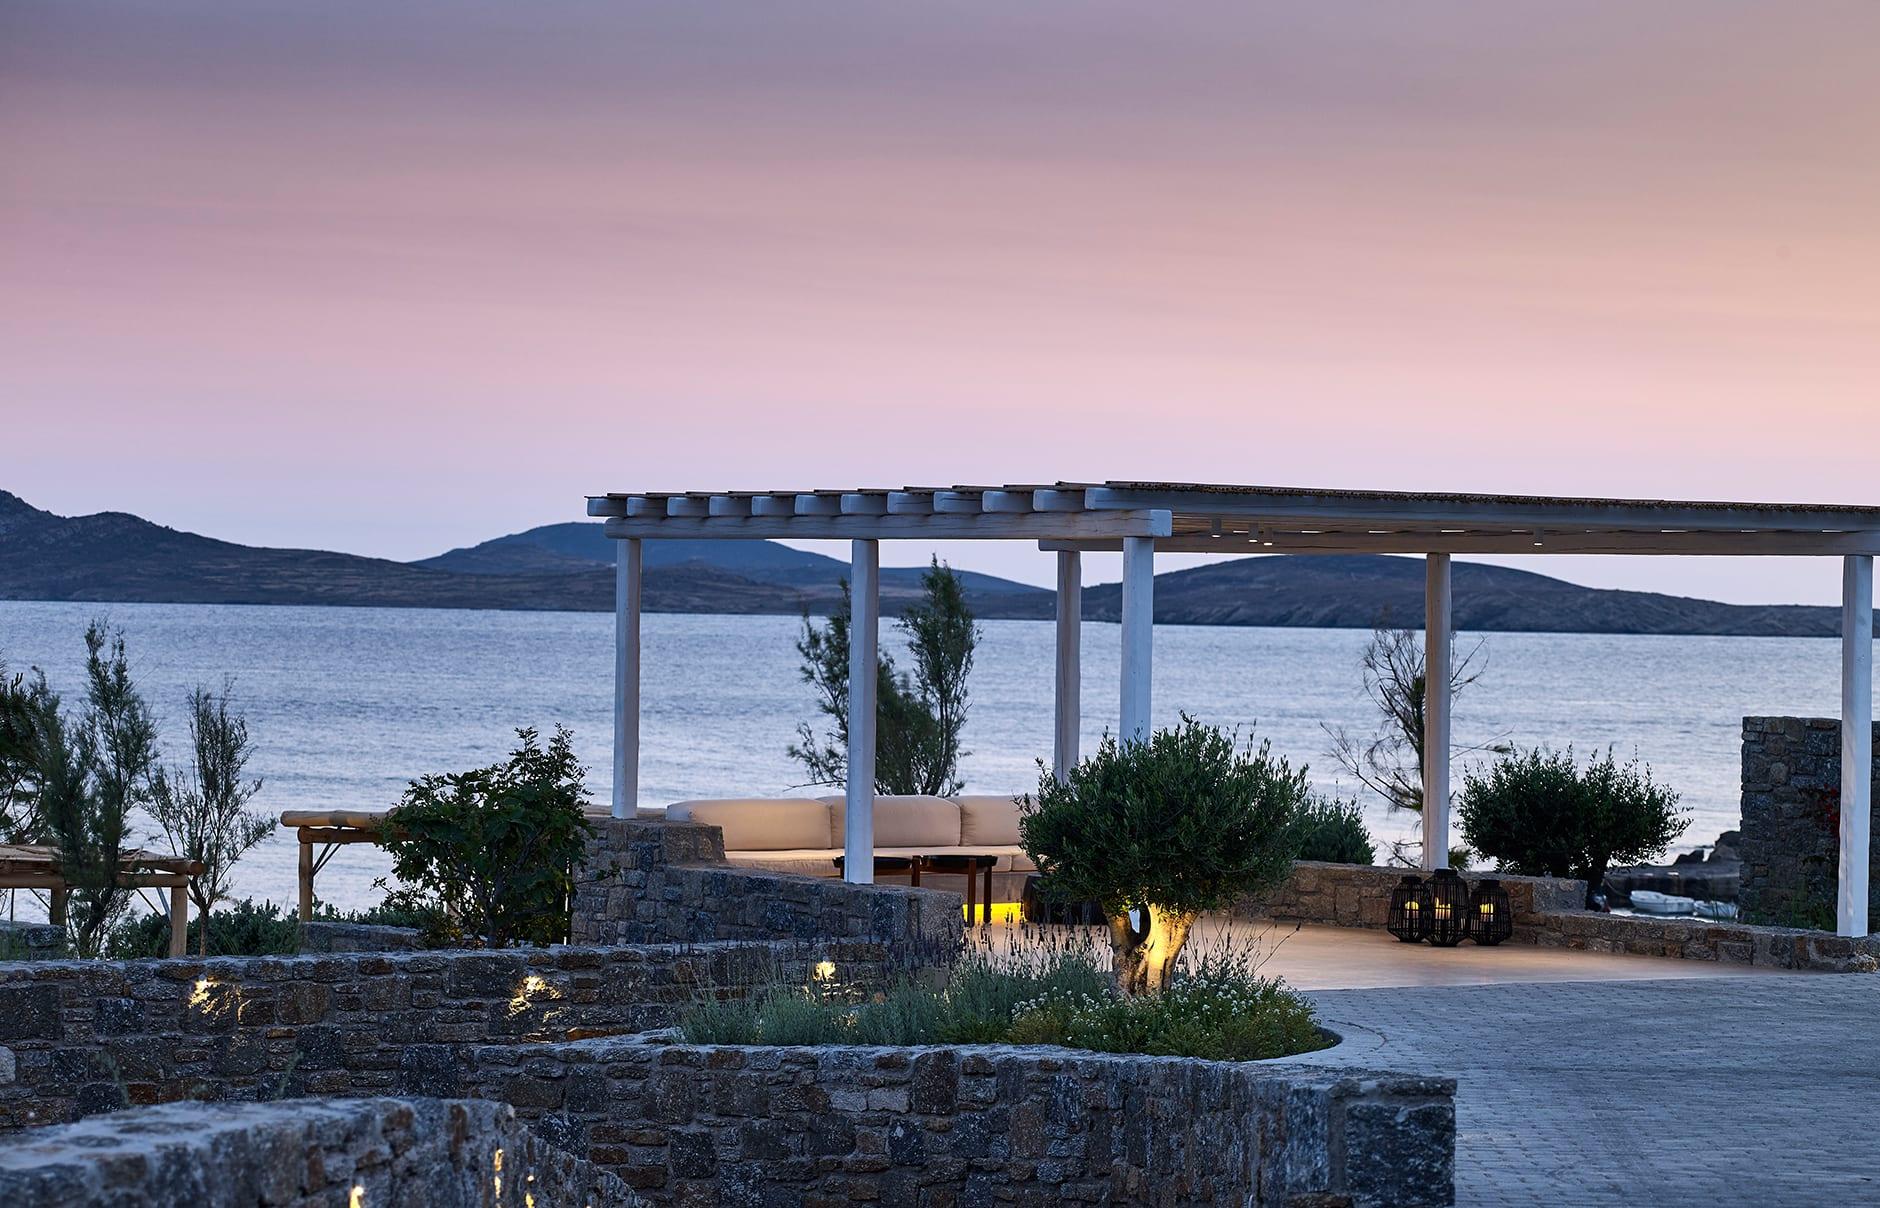 Bill & Coo Coast. Bill & Coo Mykonos. © Bill & Coo Mykonos